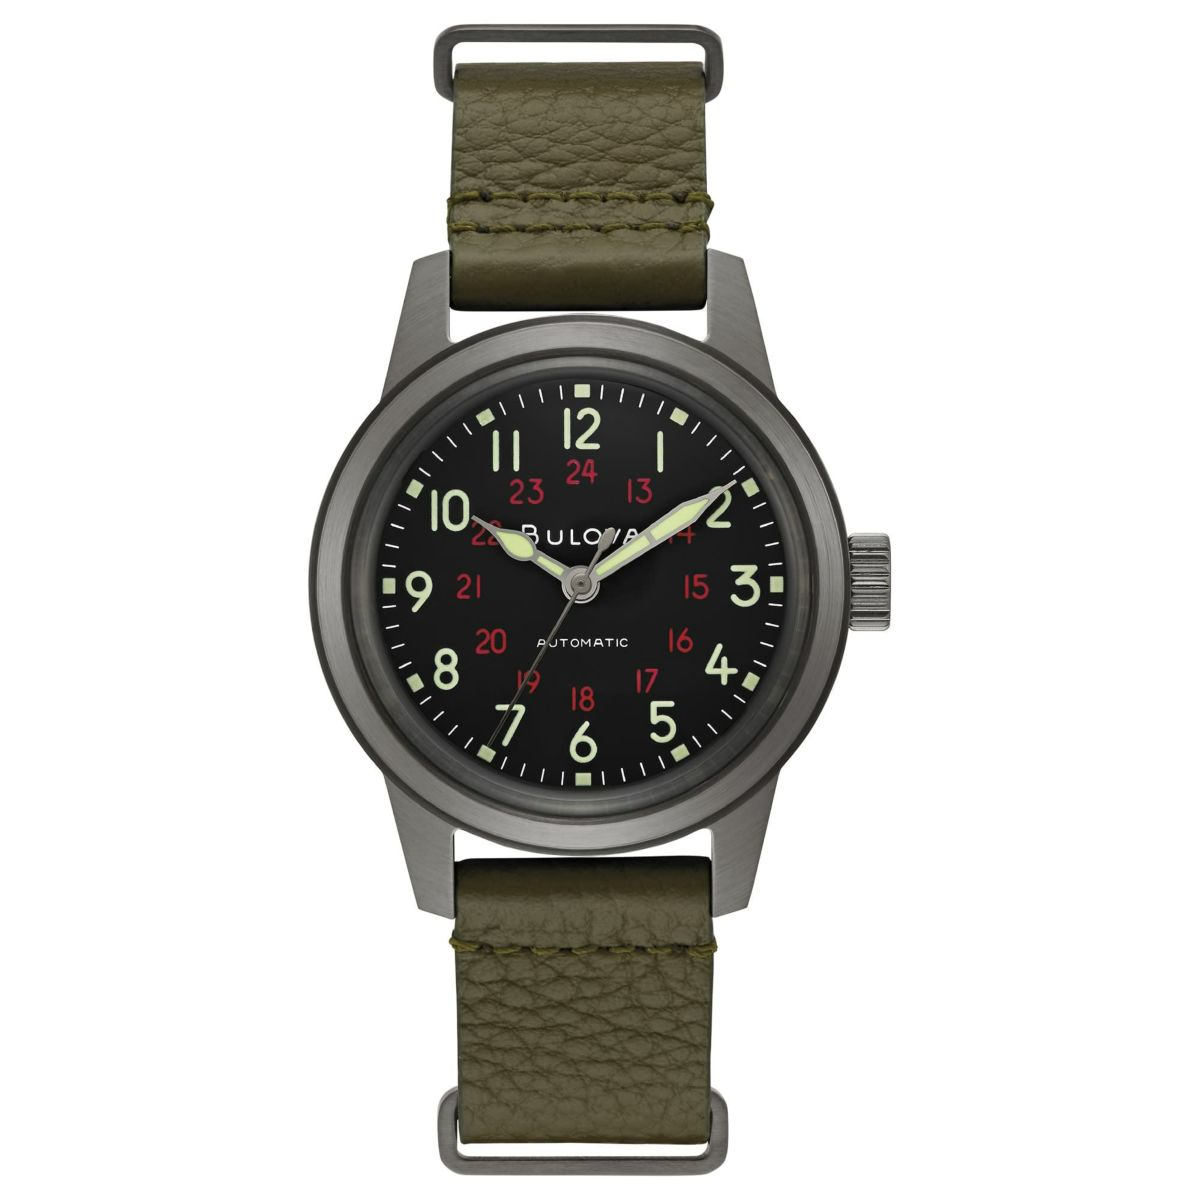 98A255 Military